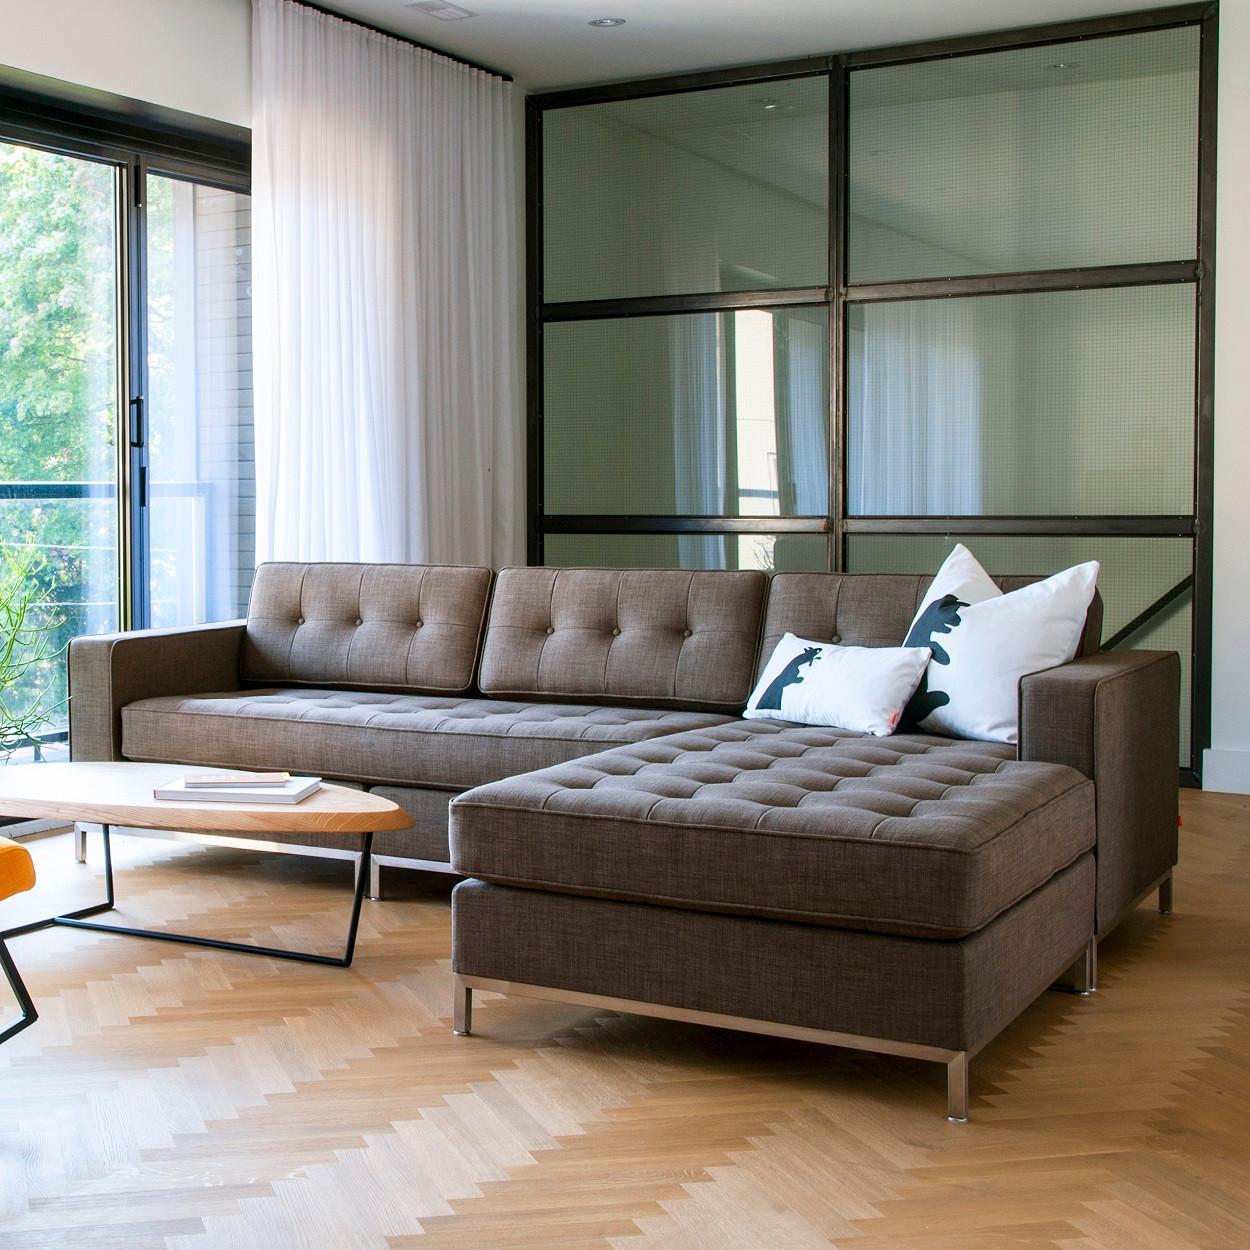 Gus modern jane bi sectional sofa